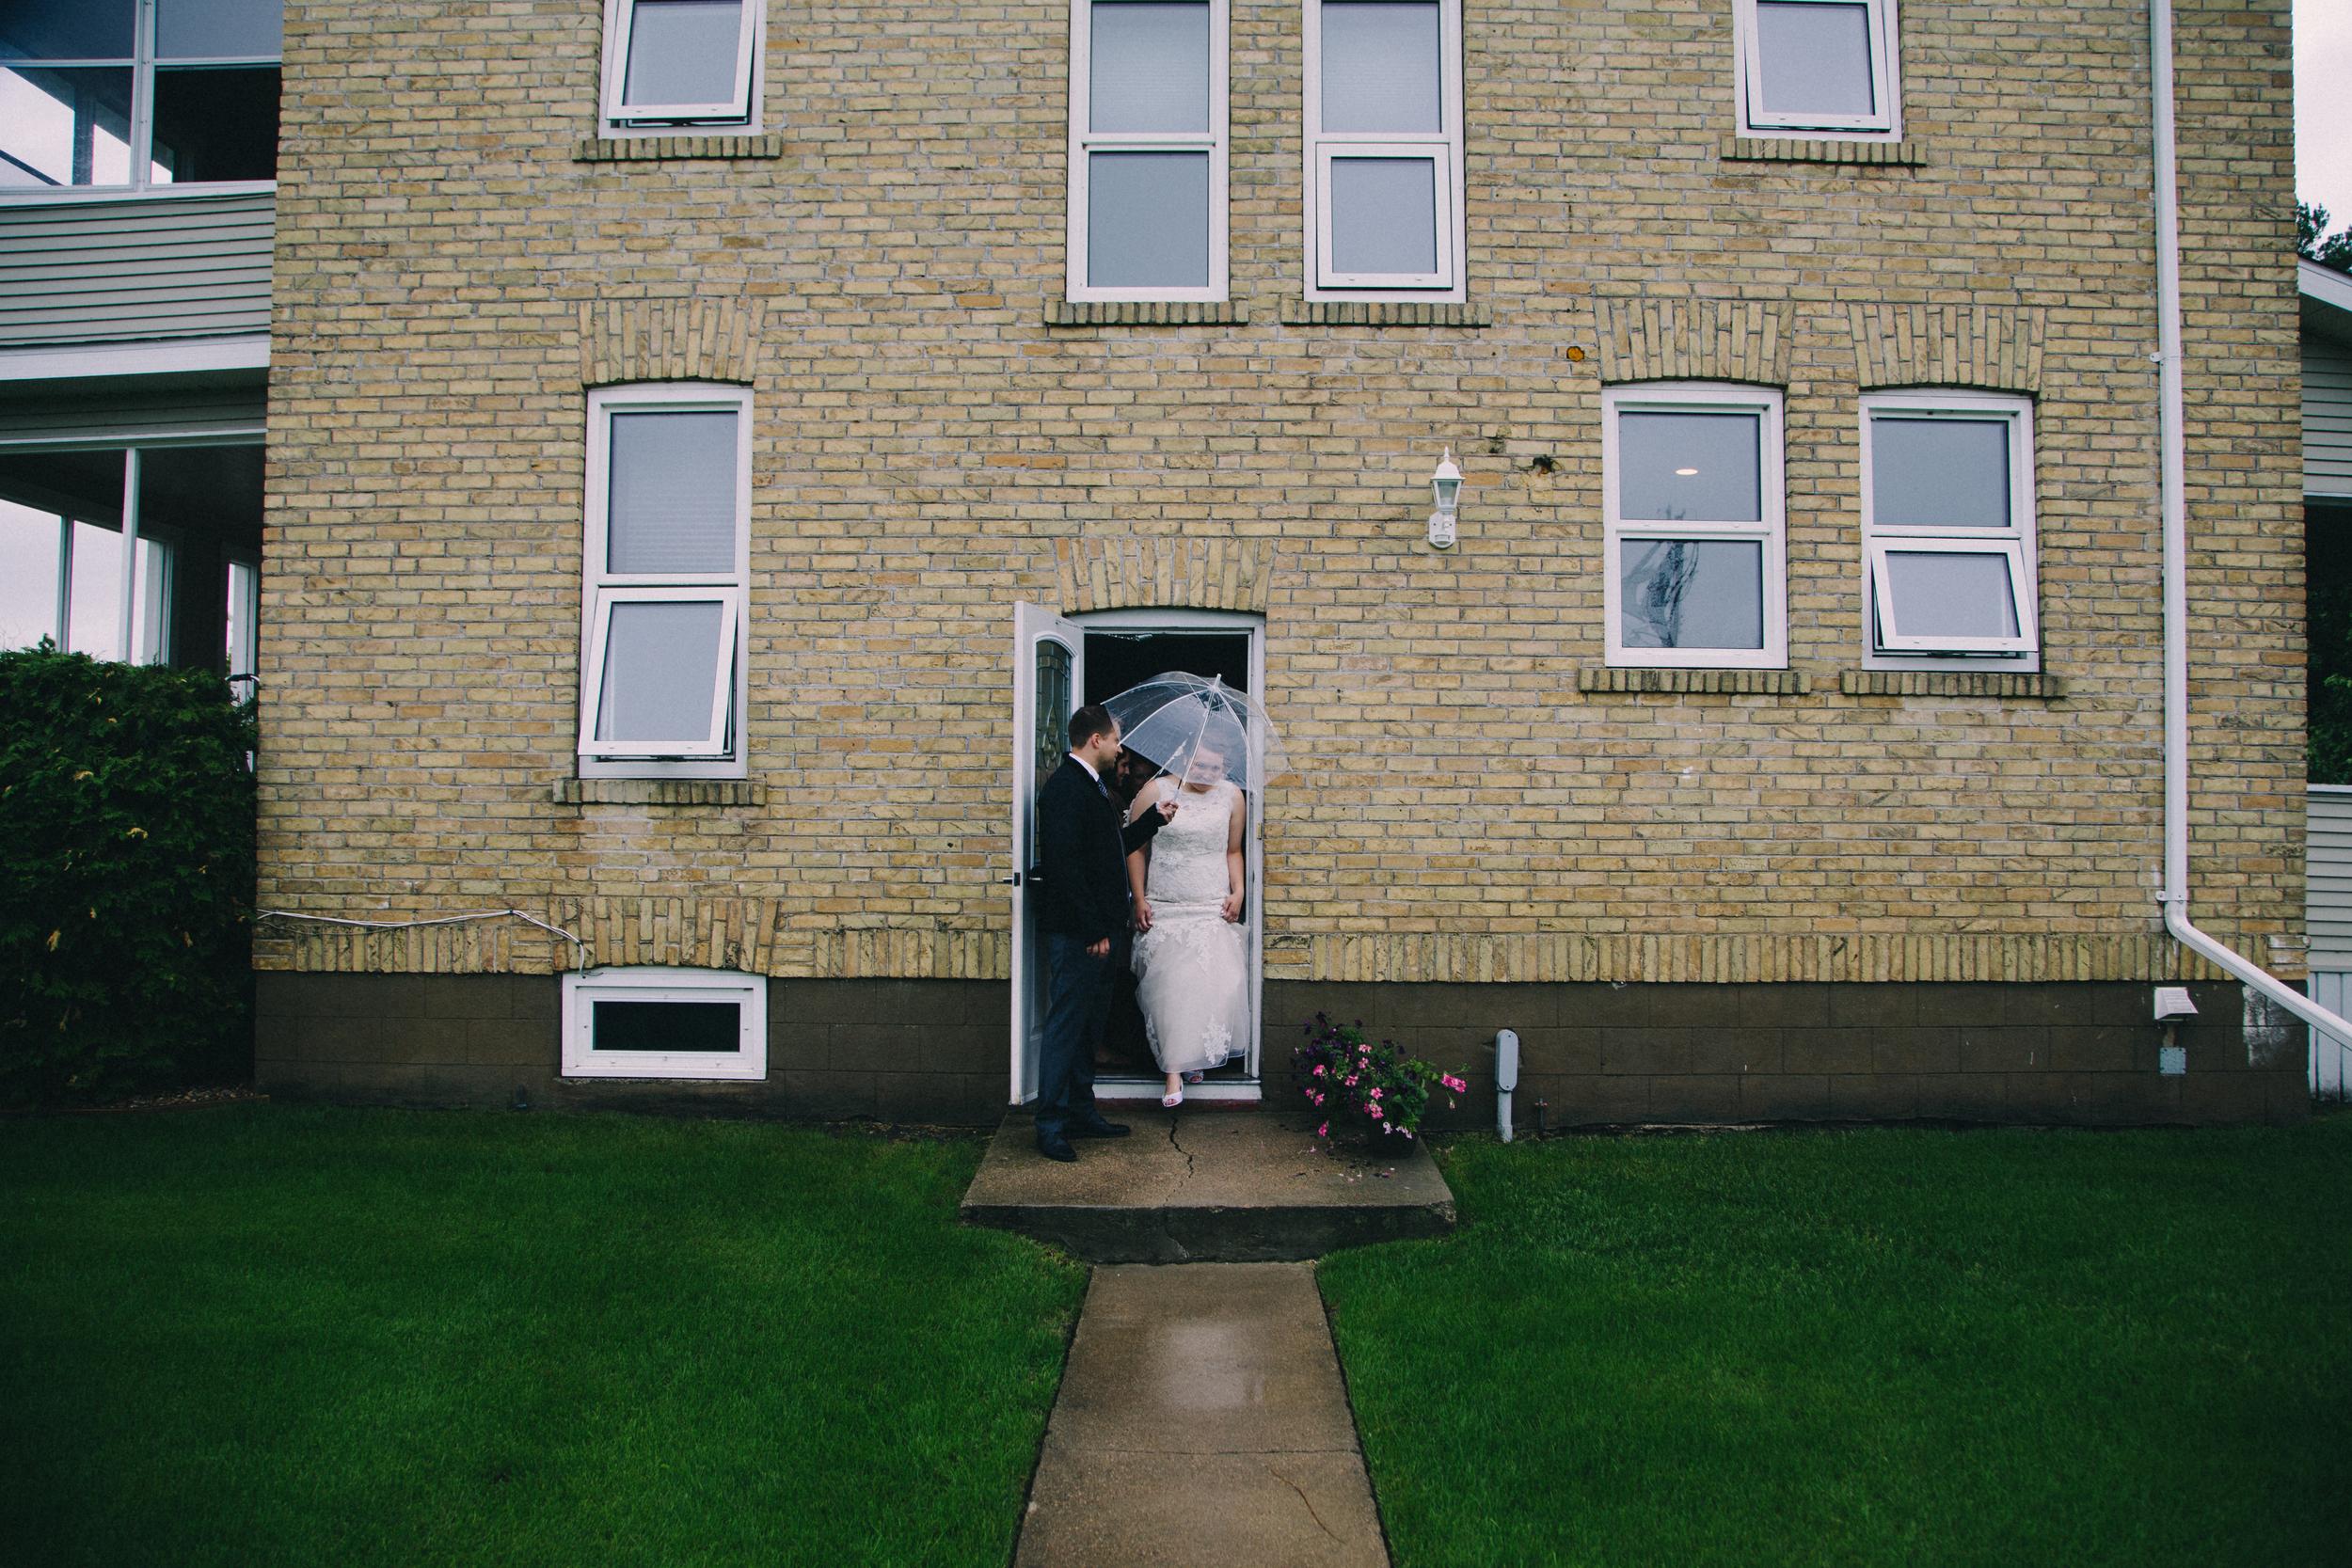 sharai siemens photo-173.jpg